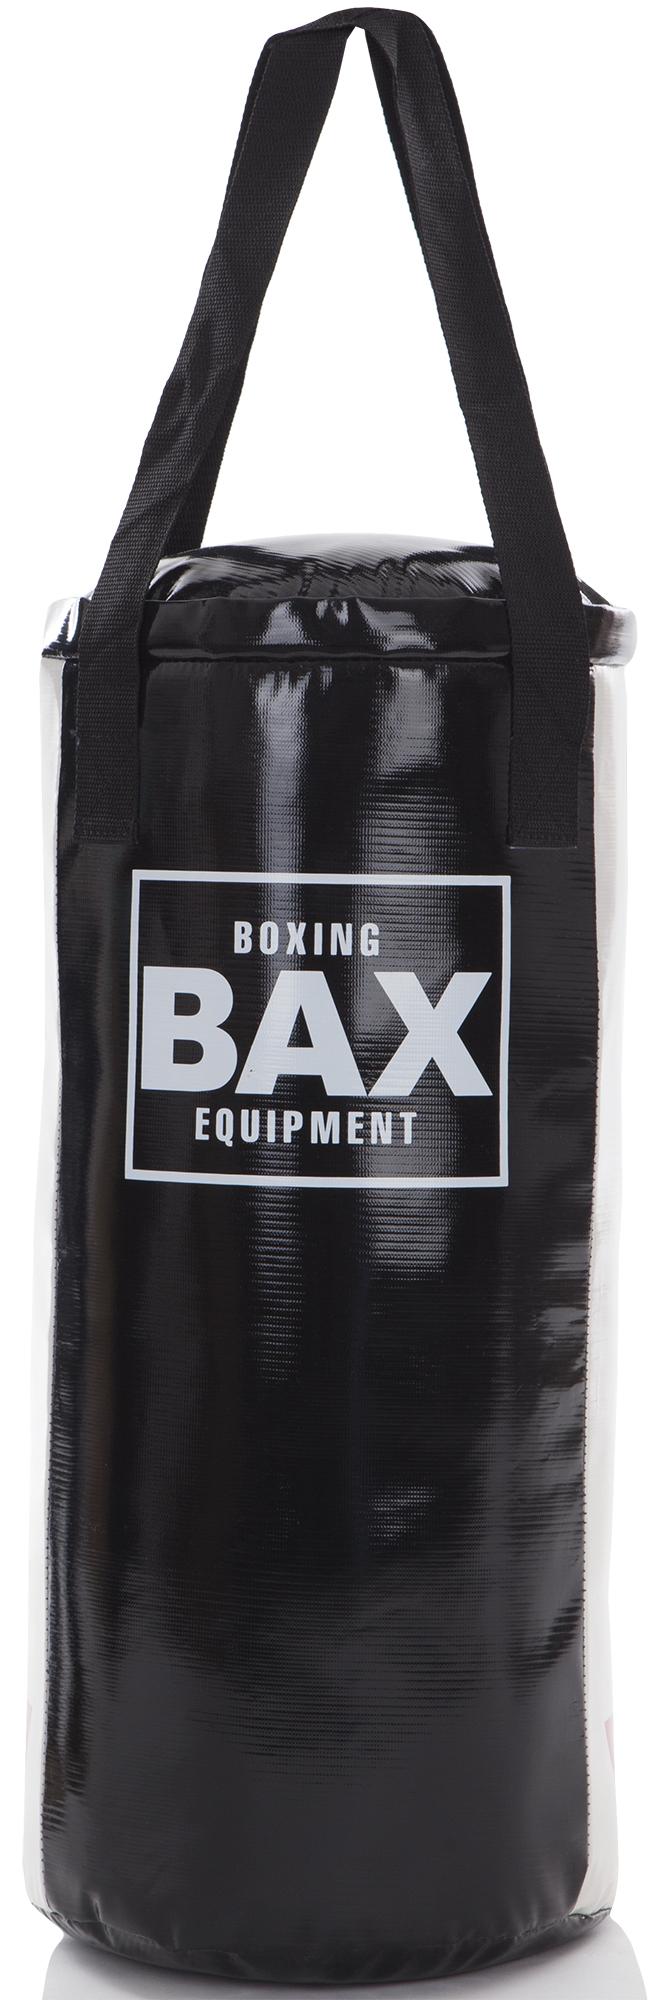 цена на Bax Мешок набивной BAX, 10 кг